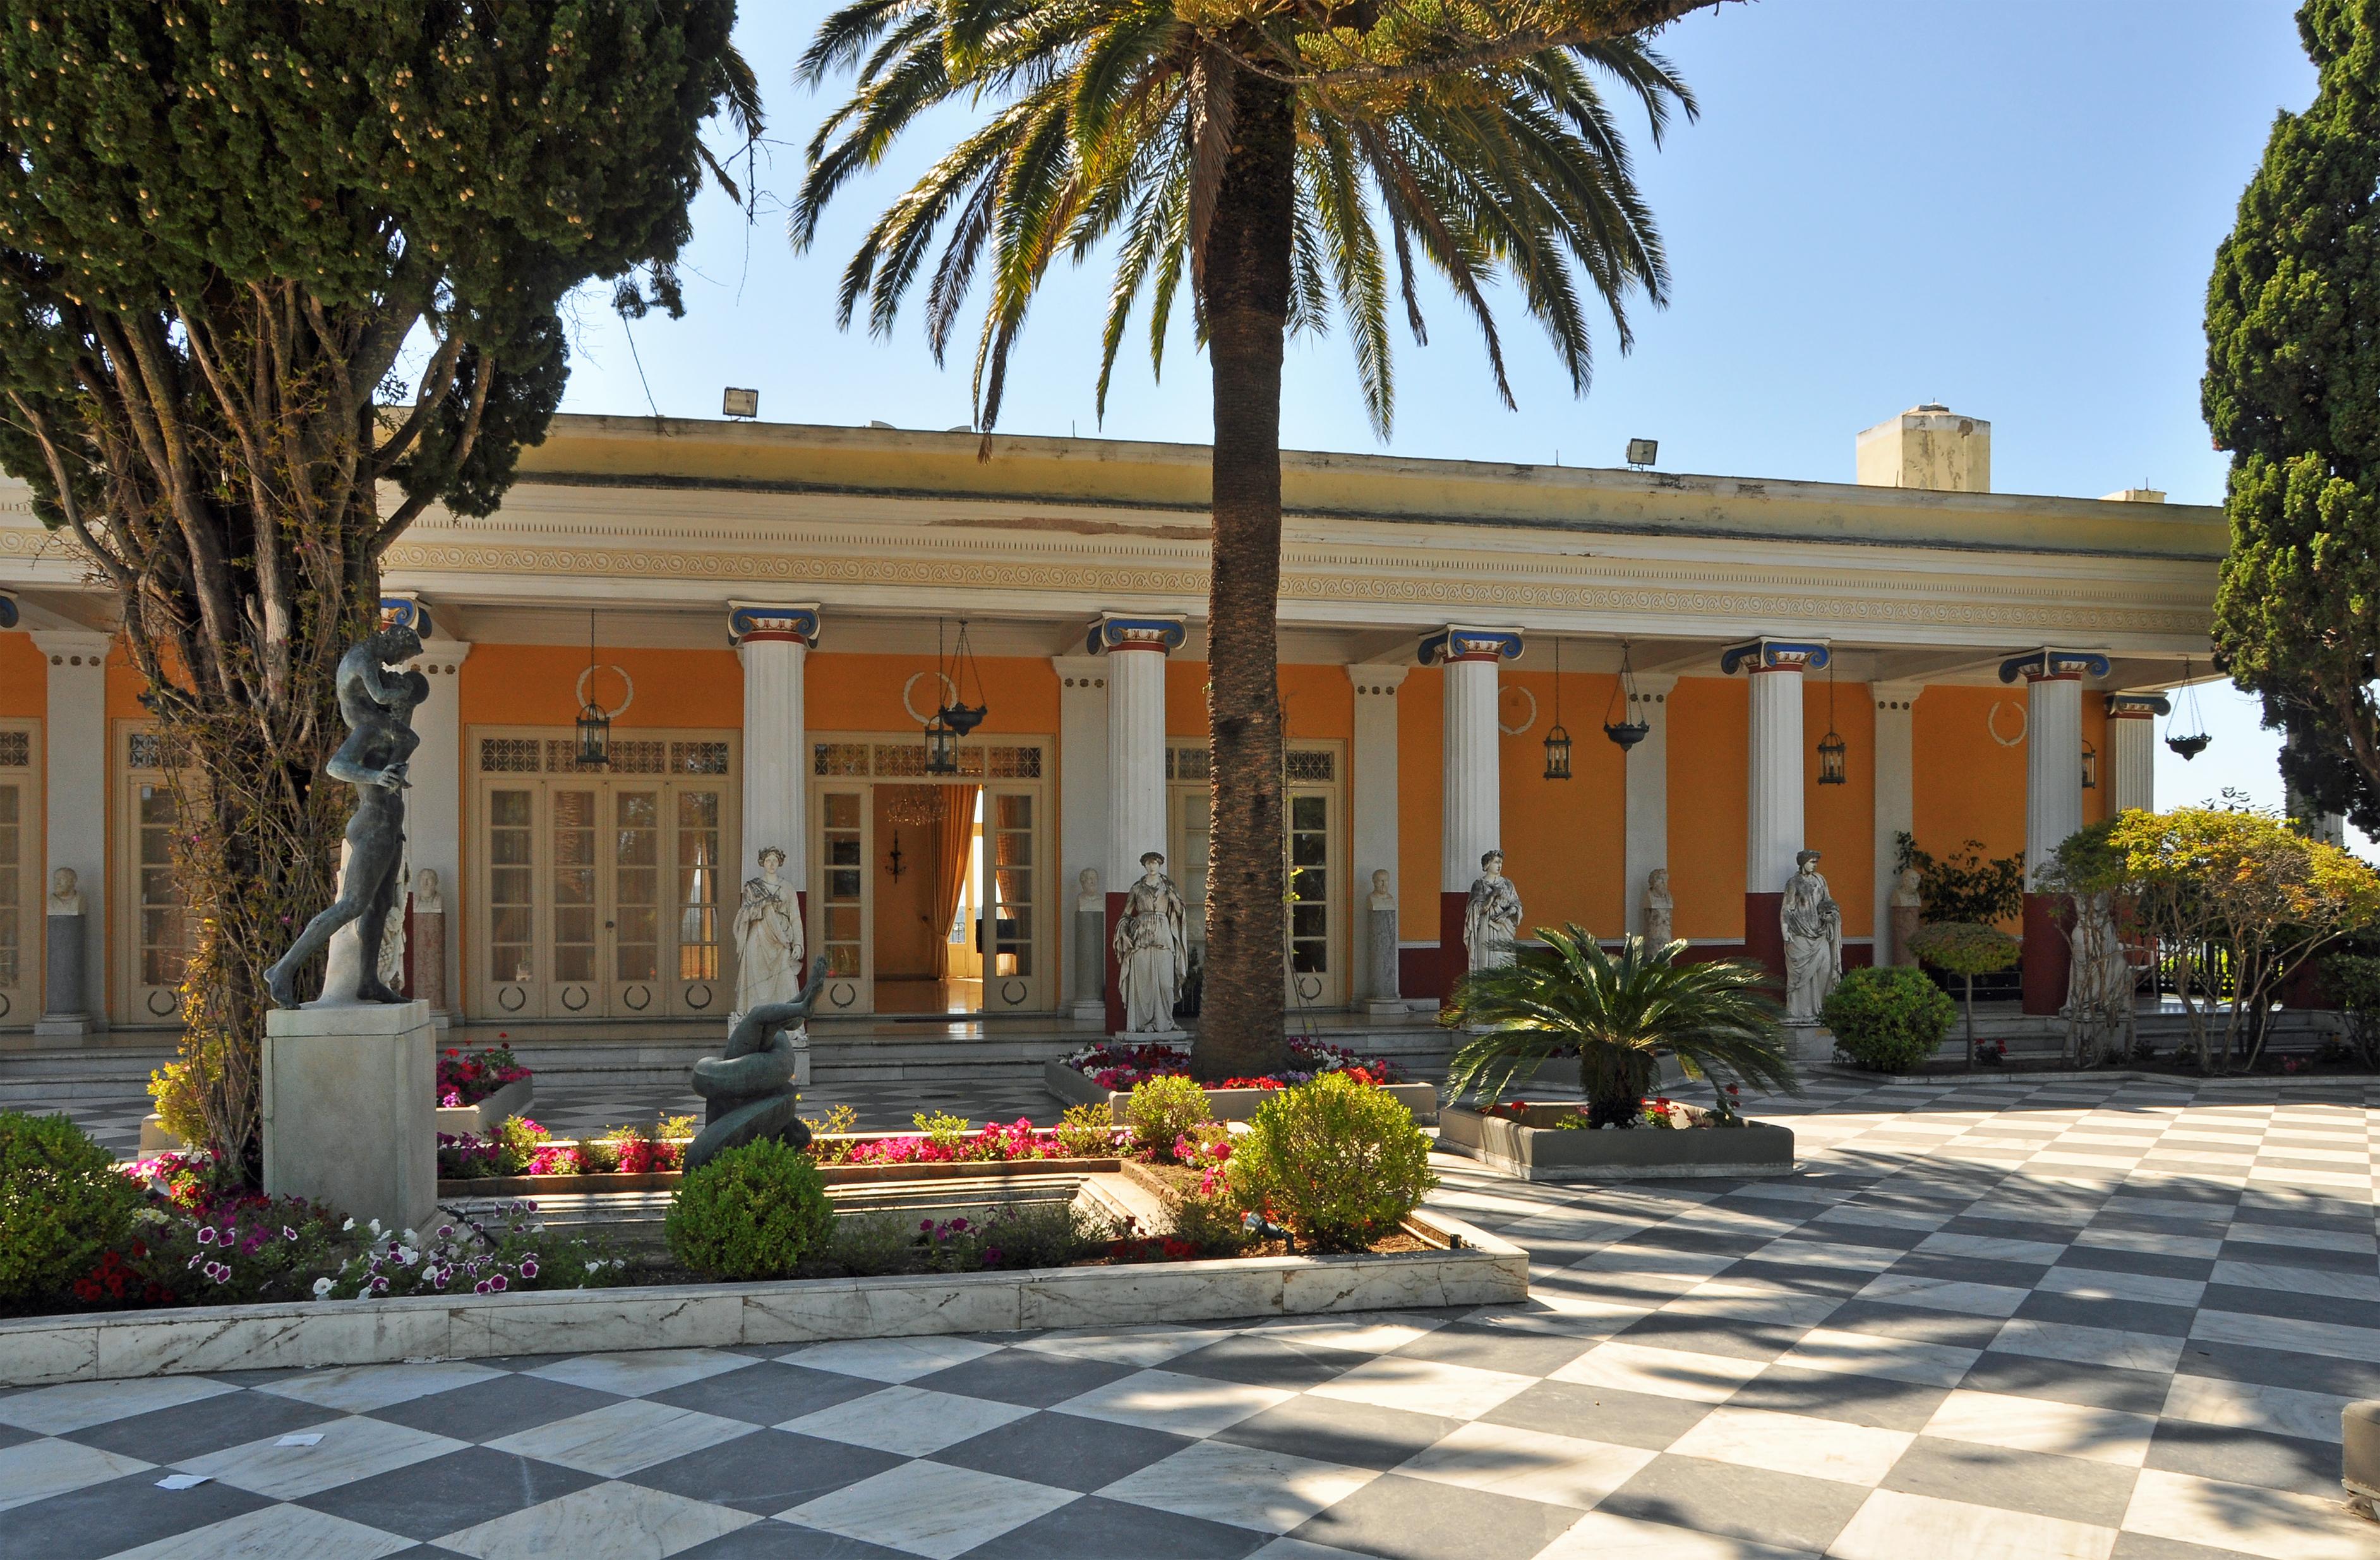 File:Corfu Achilleion R09.jpg - Wikimedia Commons